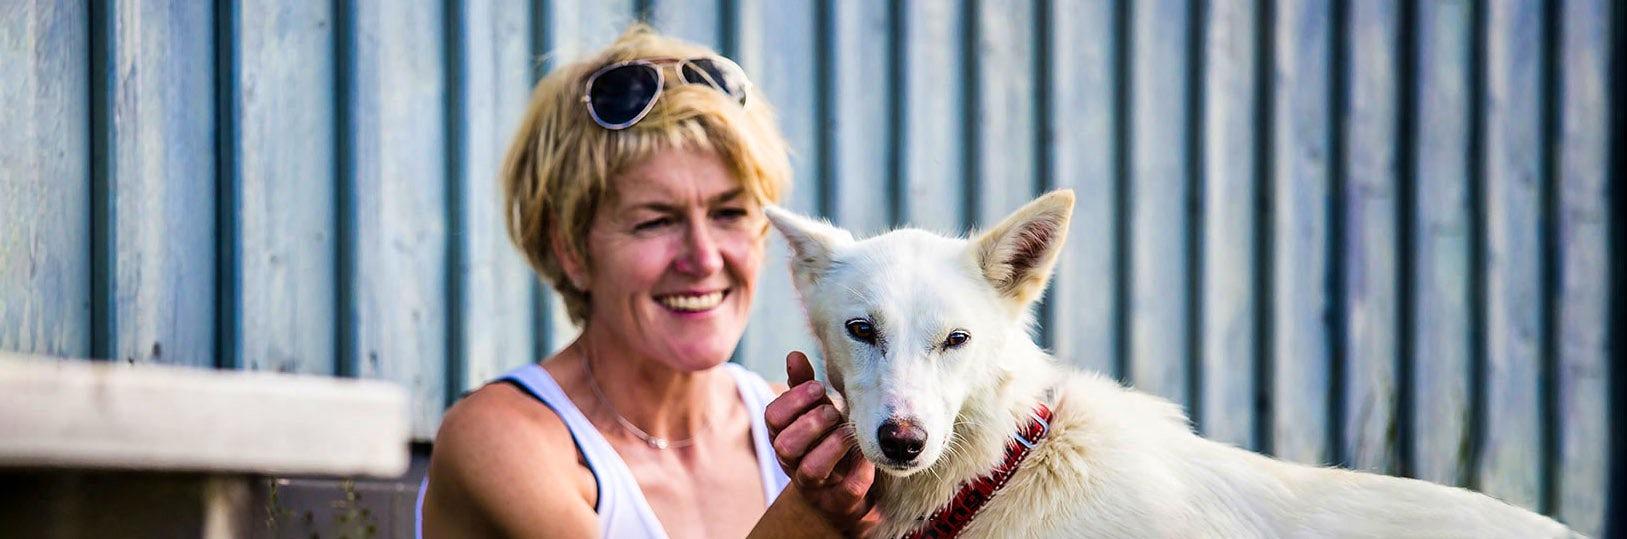 Woman hiking with dog